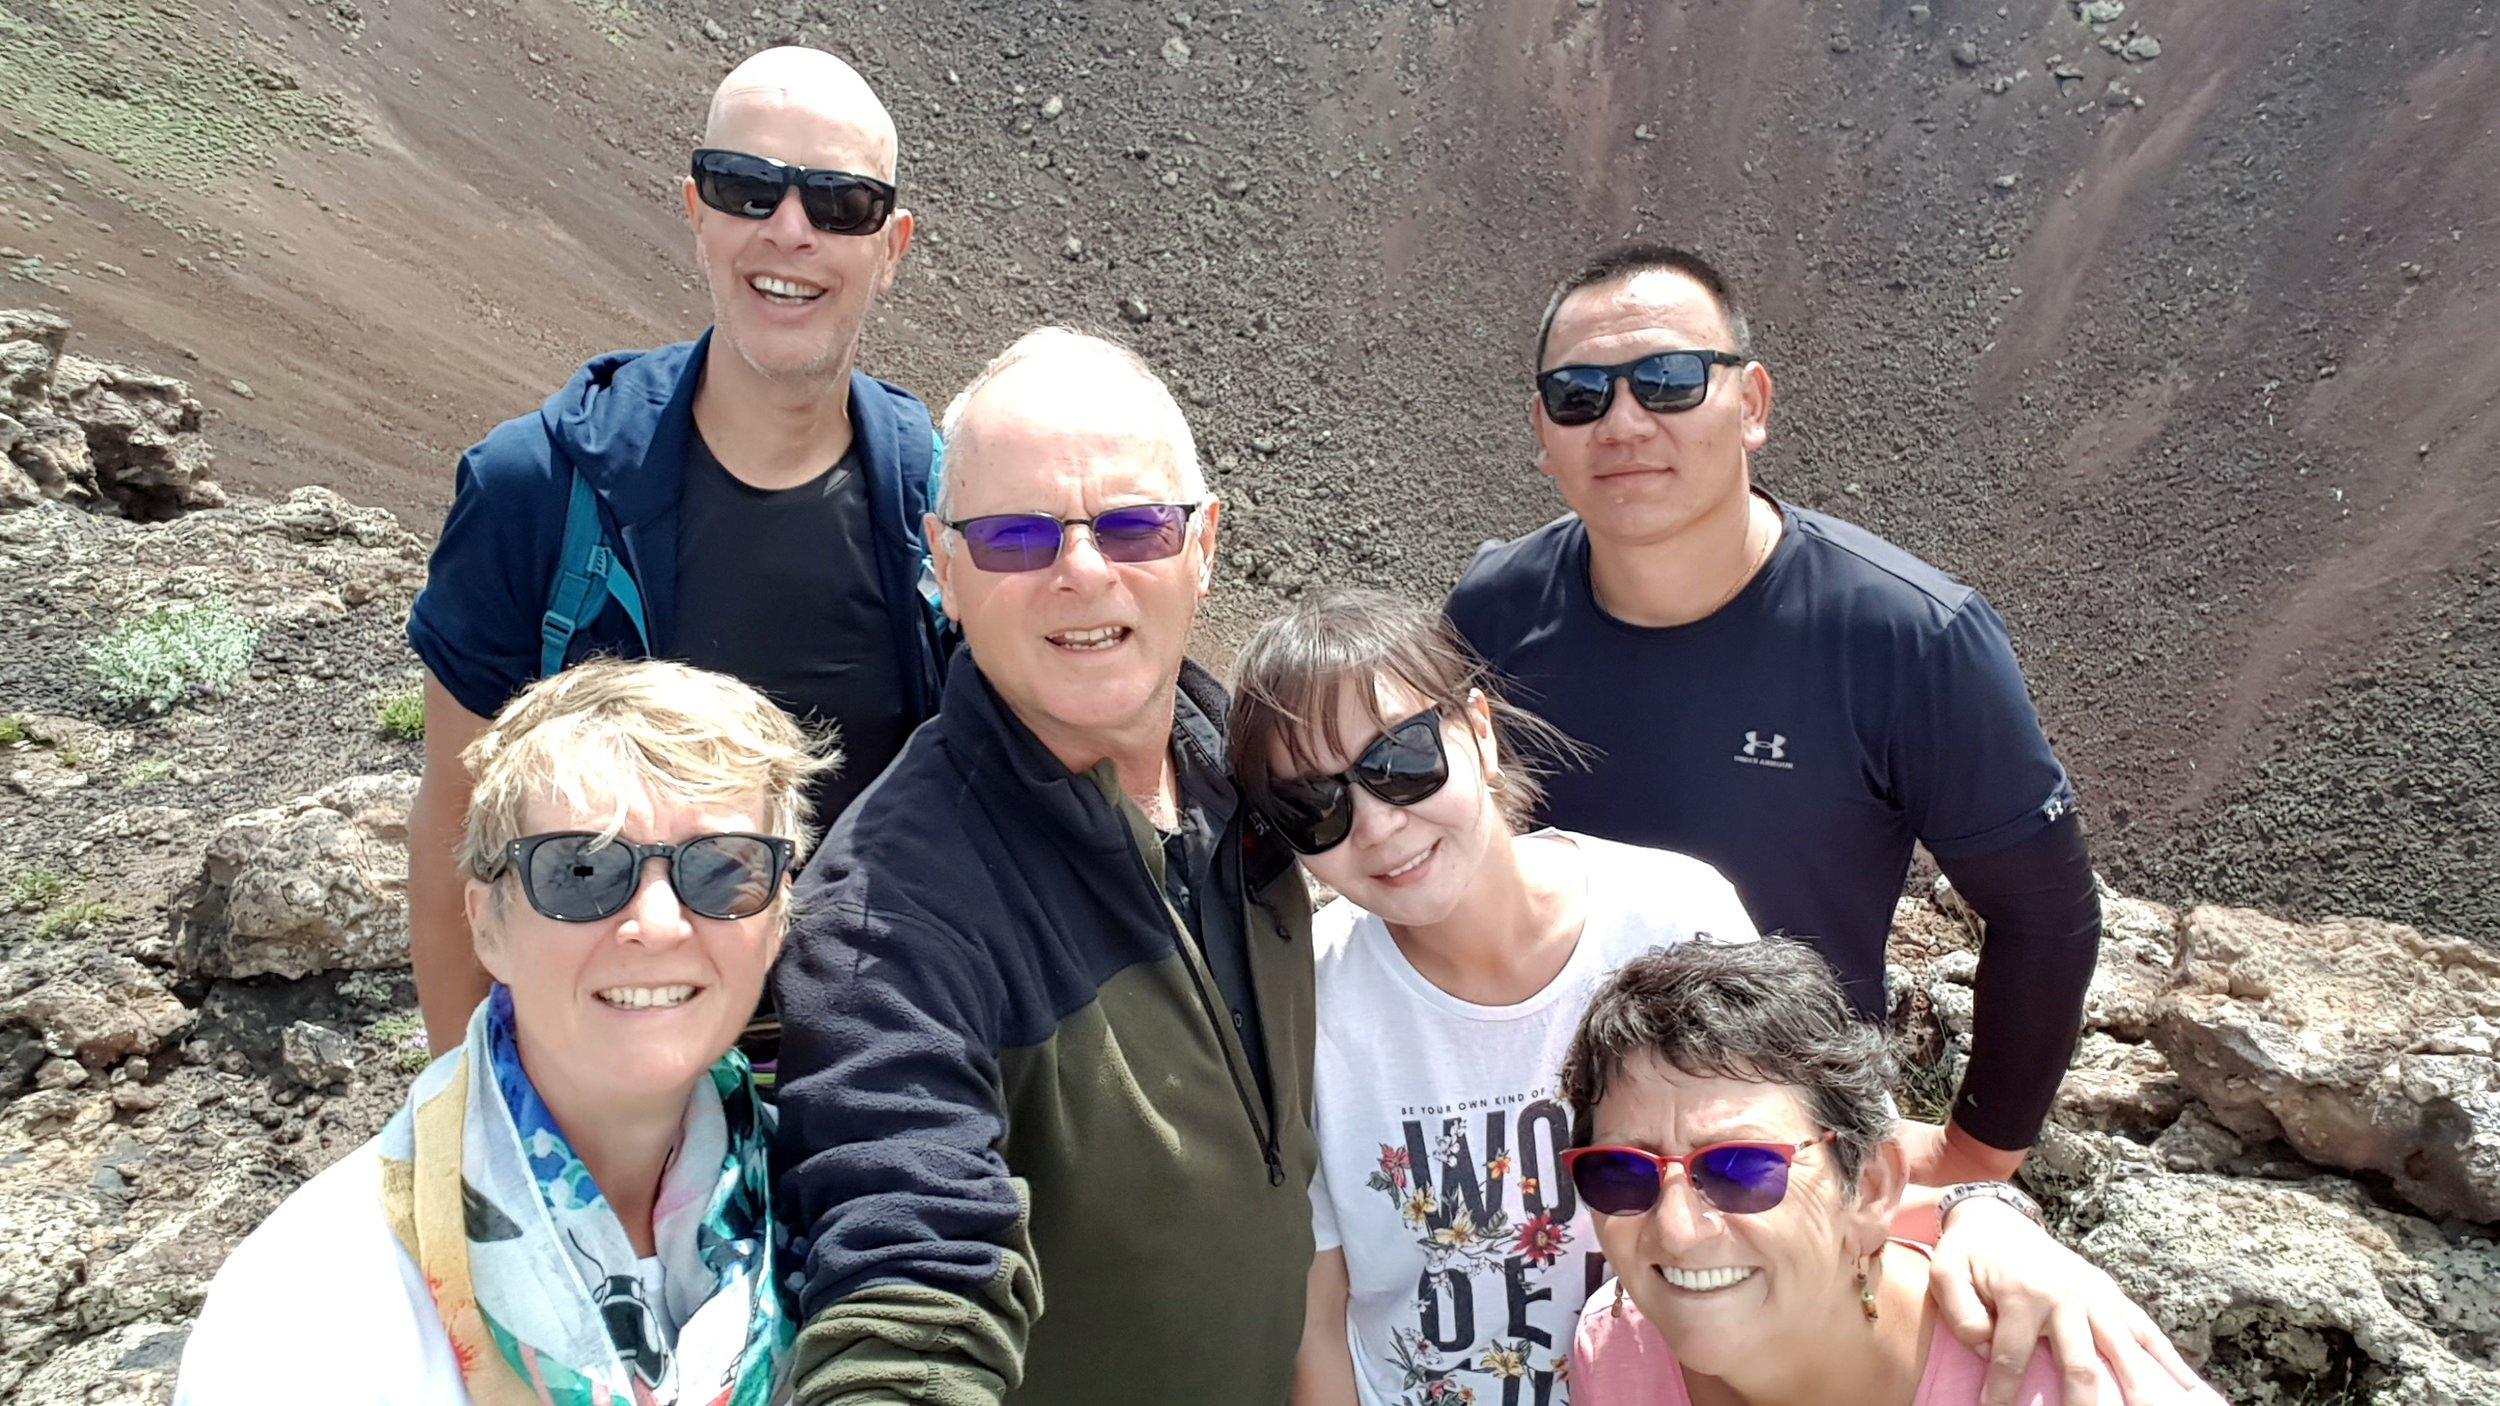 Pamela, Berry, Francien, Sheeze, Tuggy and Frank on the Khorgo Uul volcano